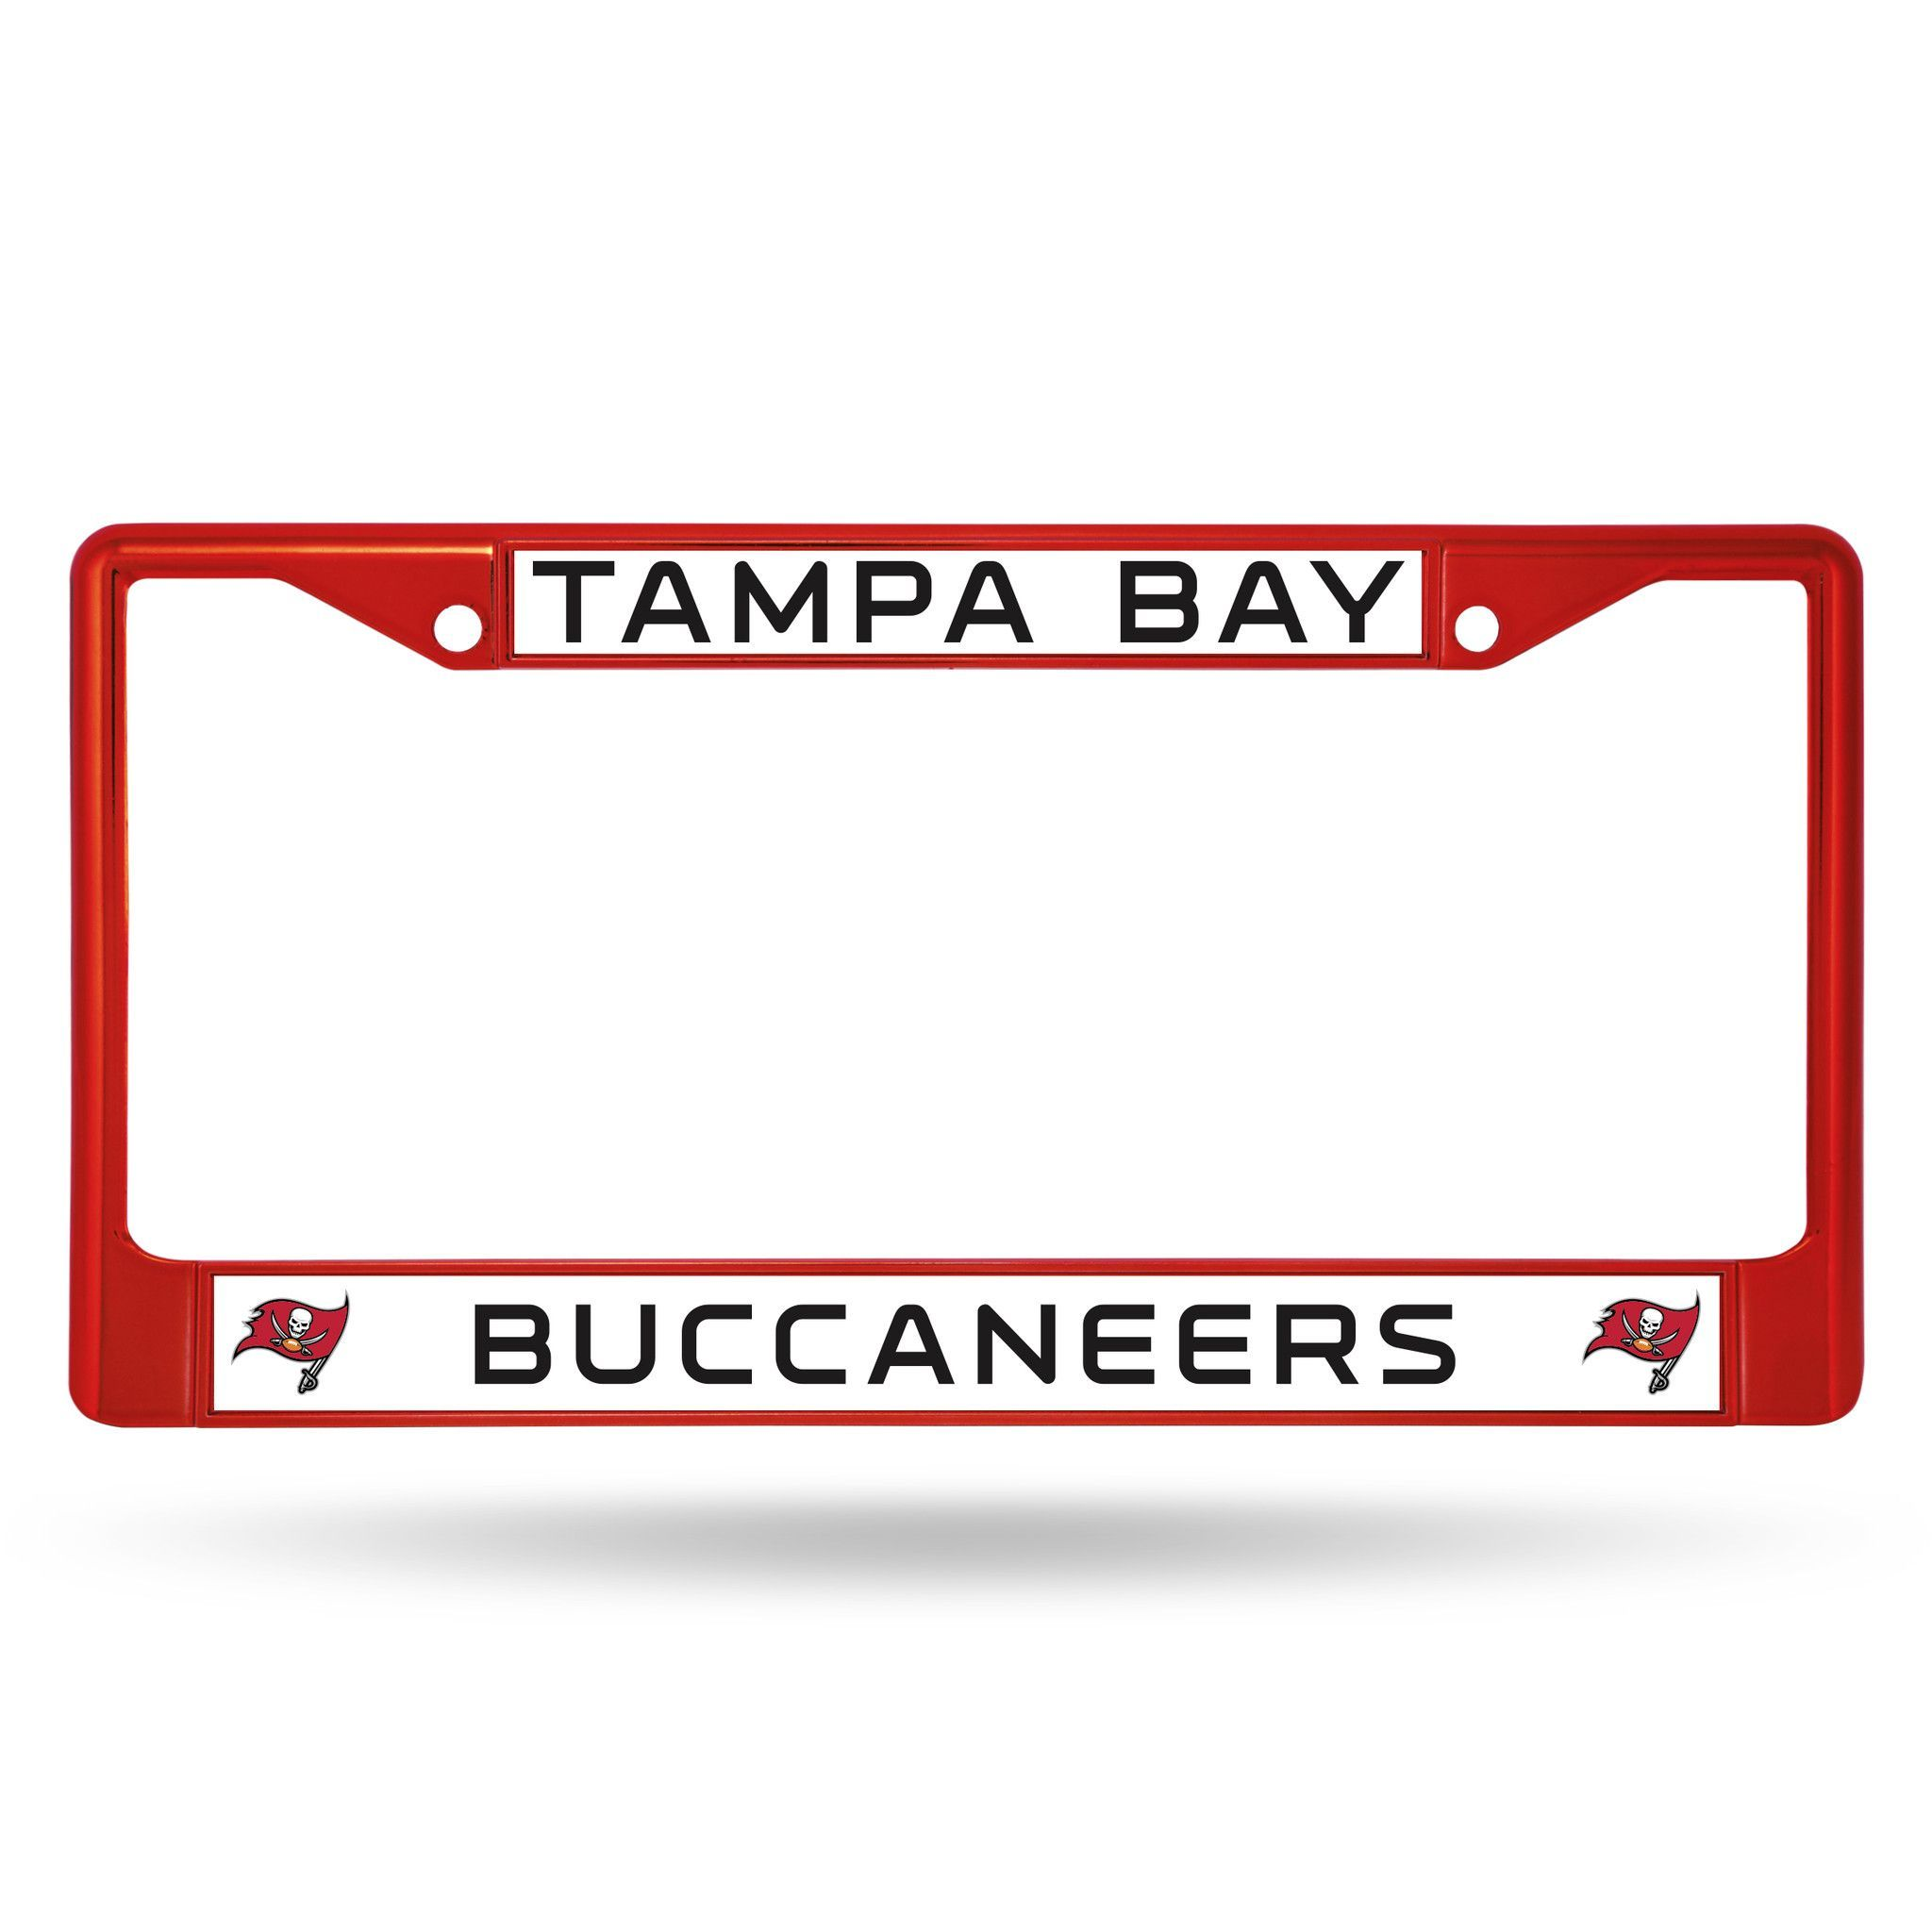 Tampa Bay Buccaneers Metal License Plate Frame - Red